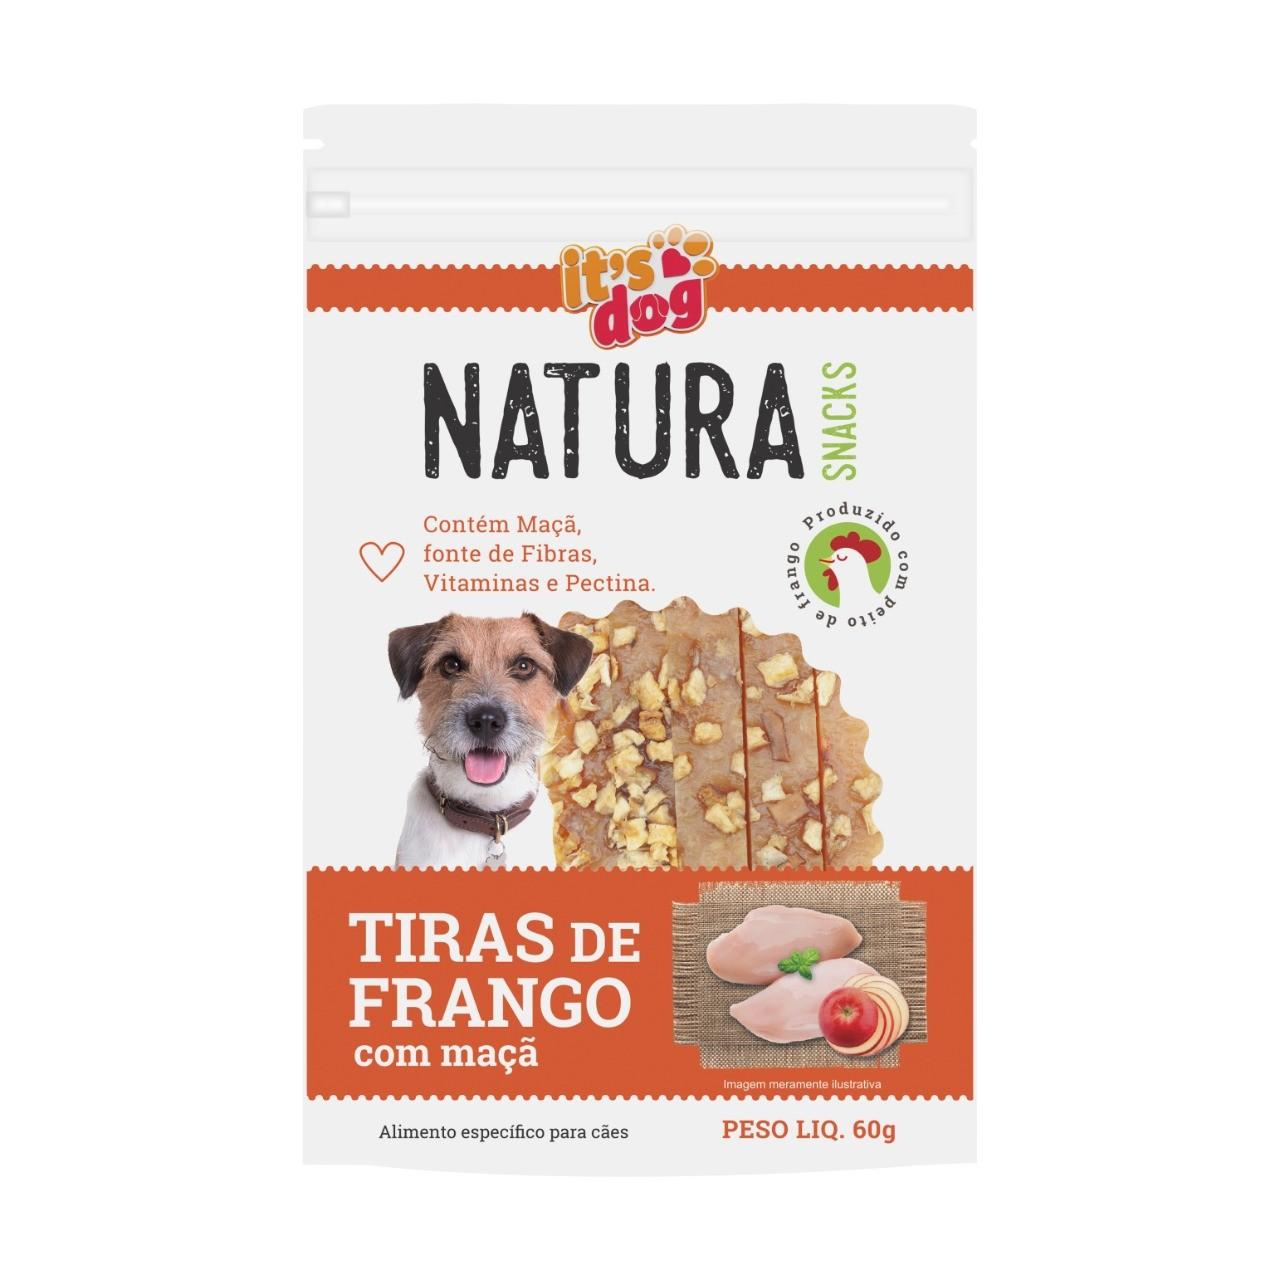 Snack Natura Tiras de Frango Desitratada 100% Natural - 60g